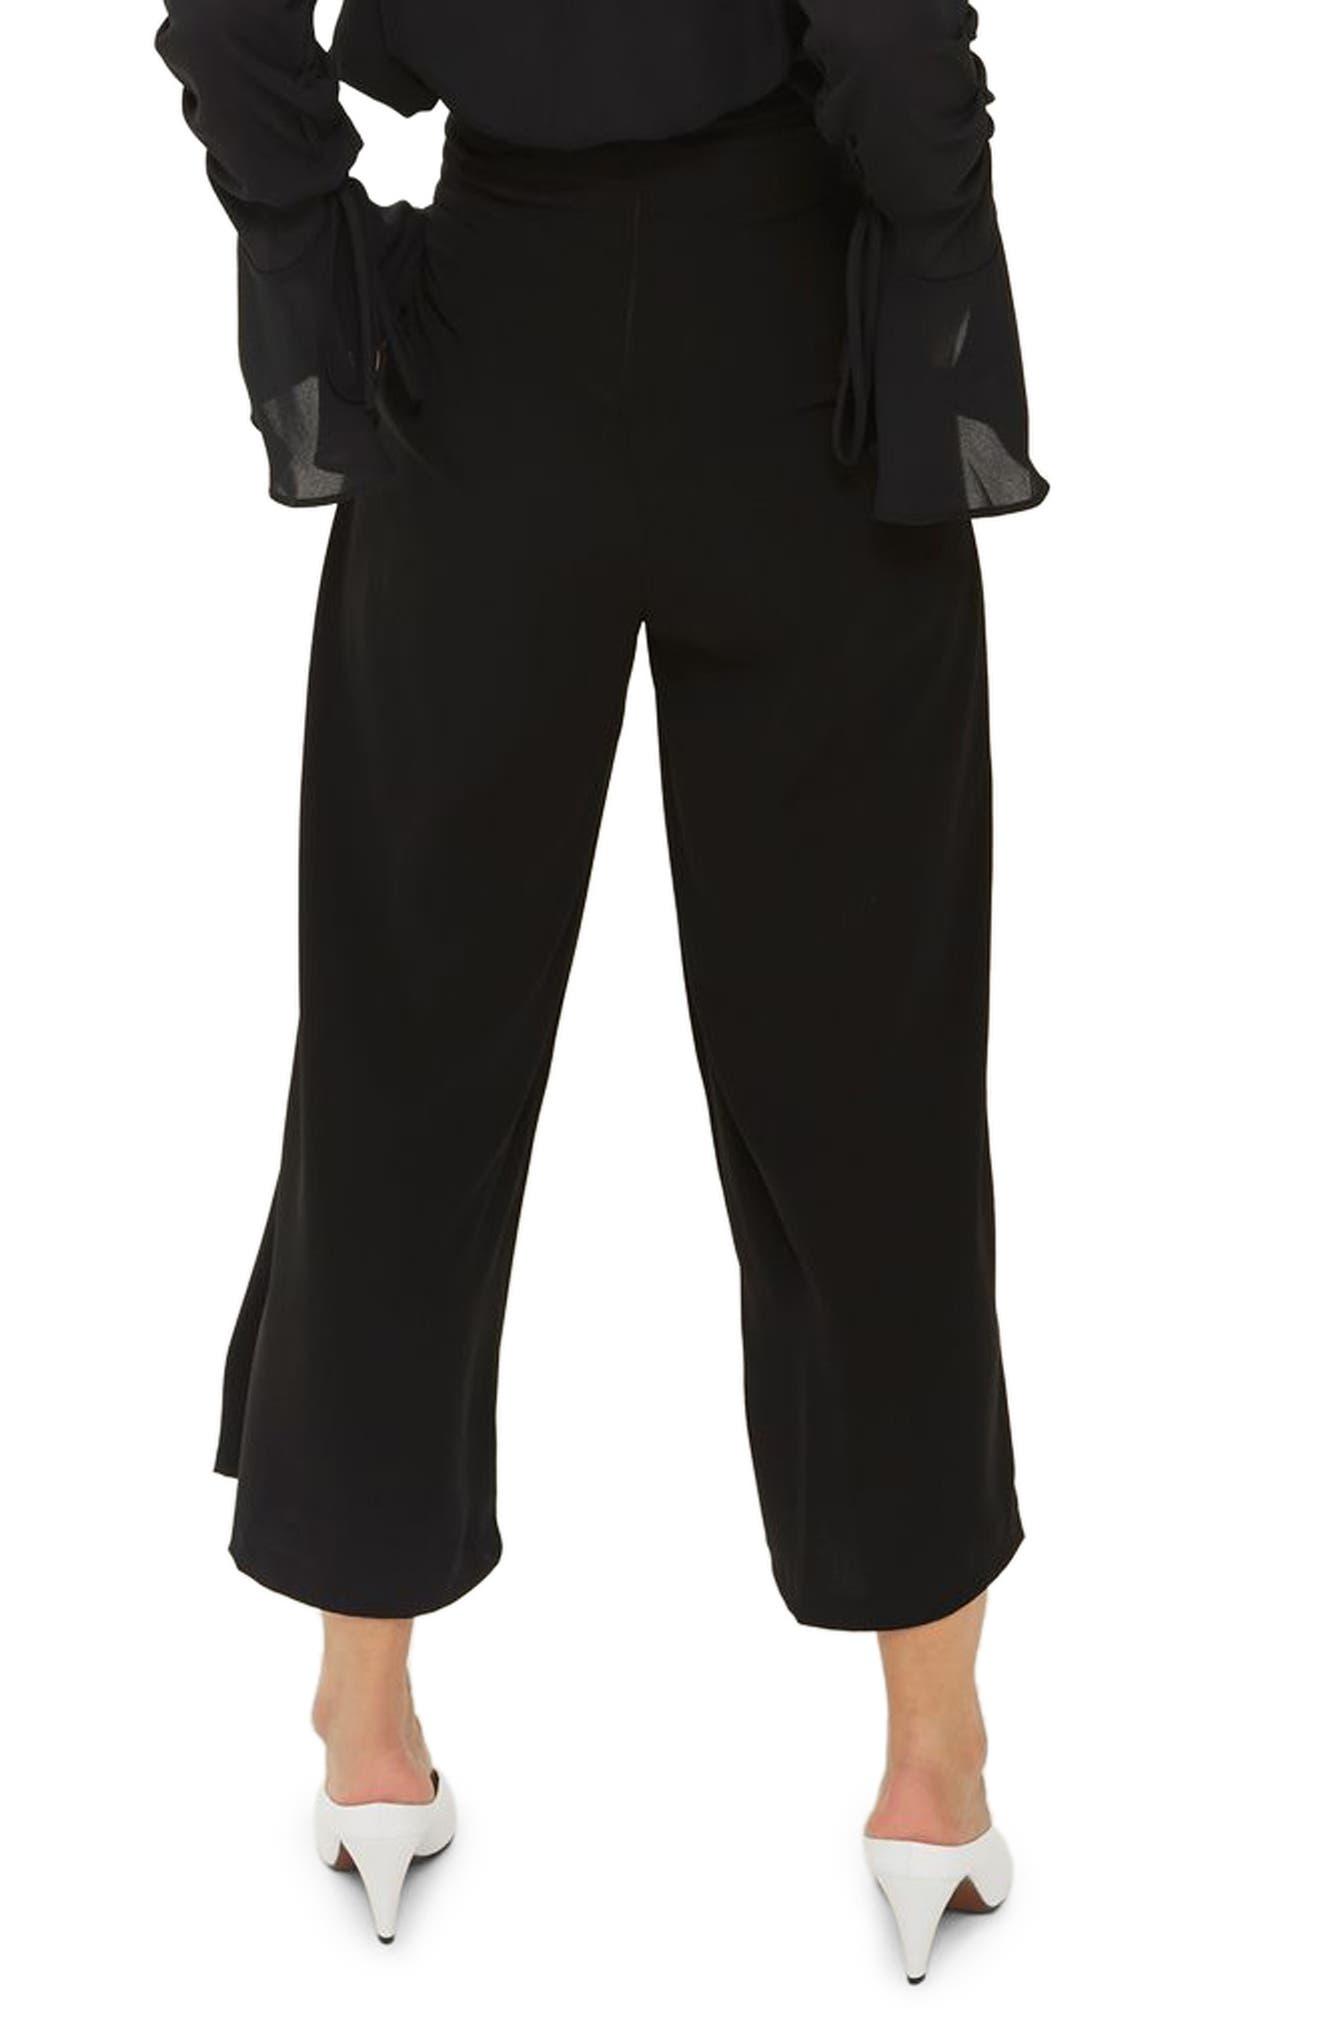 Main Image - Topshop Lattice Crop Wide Leg Trousers